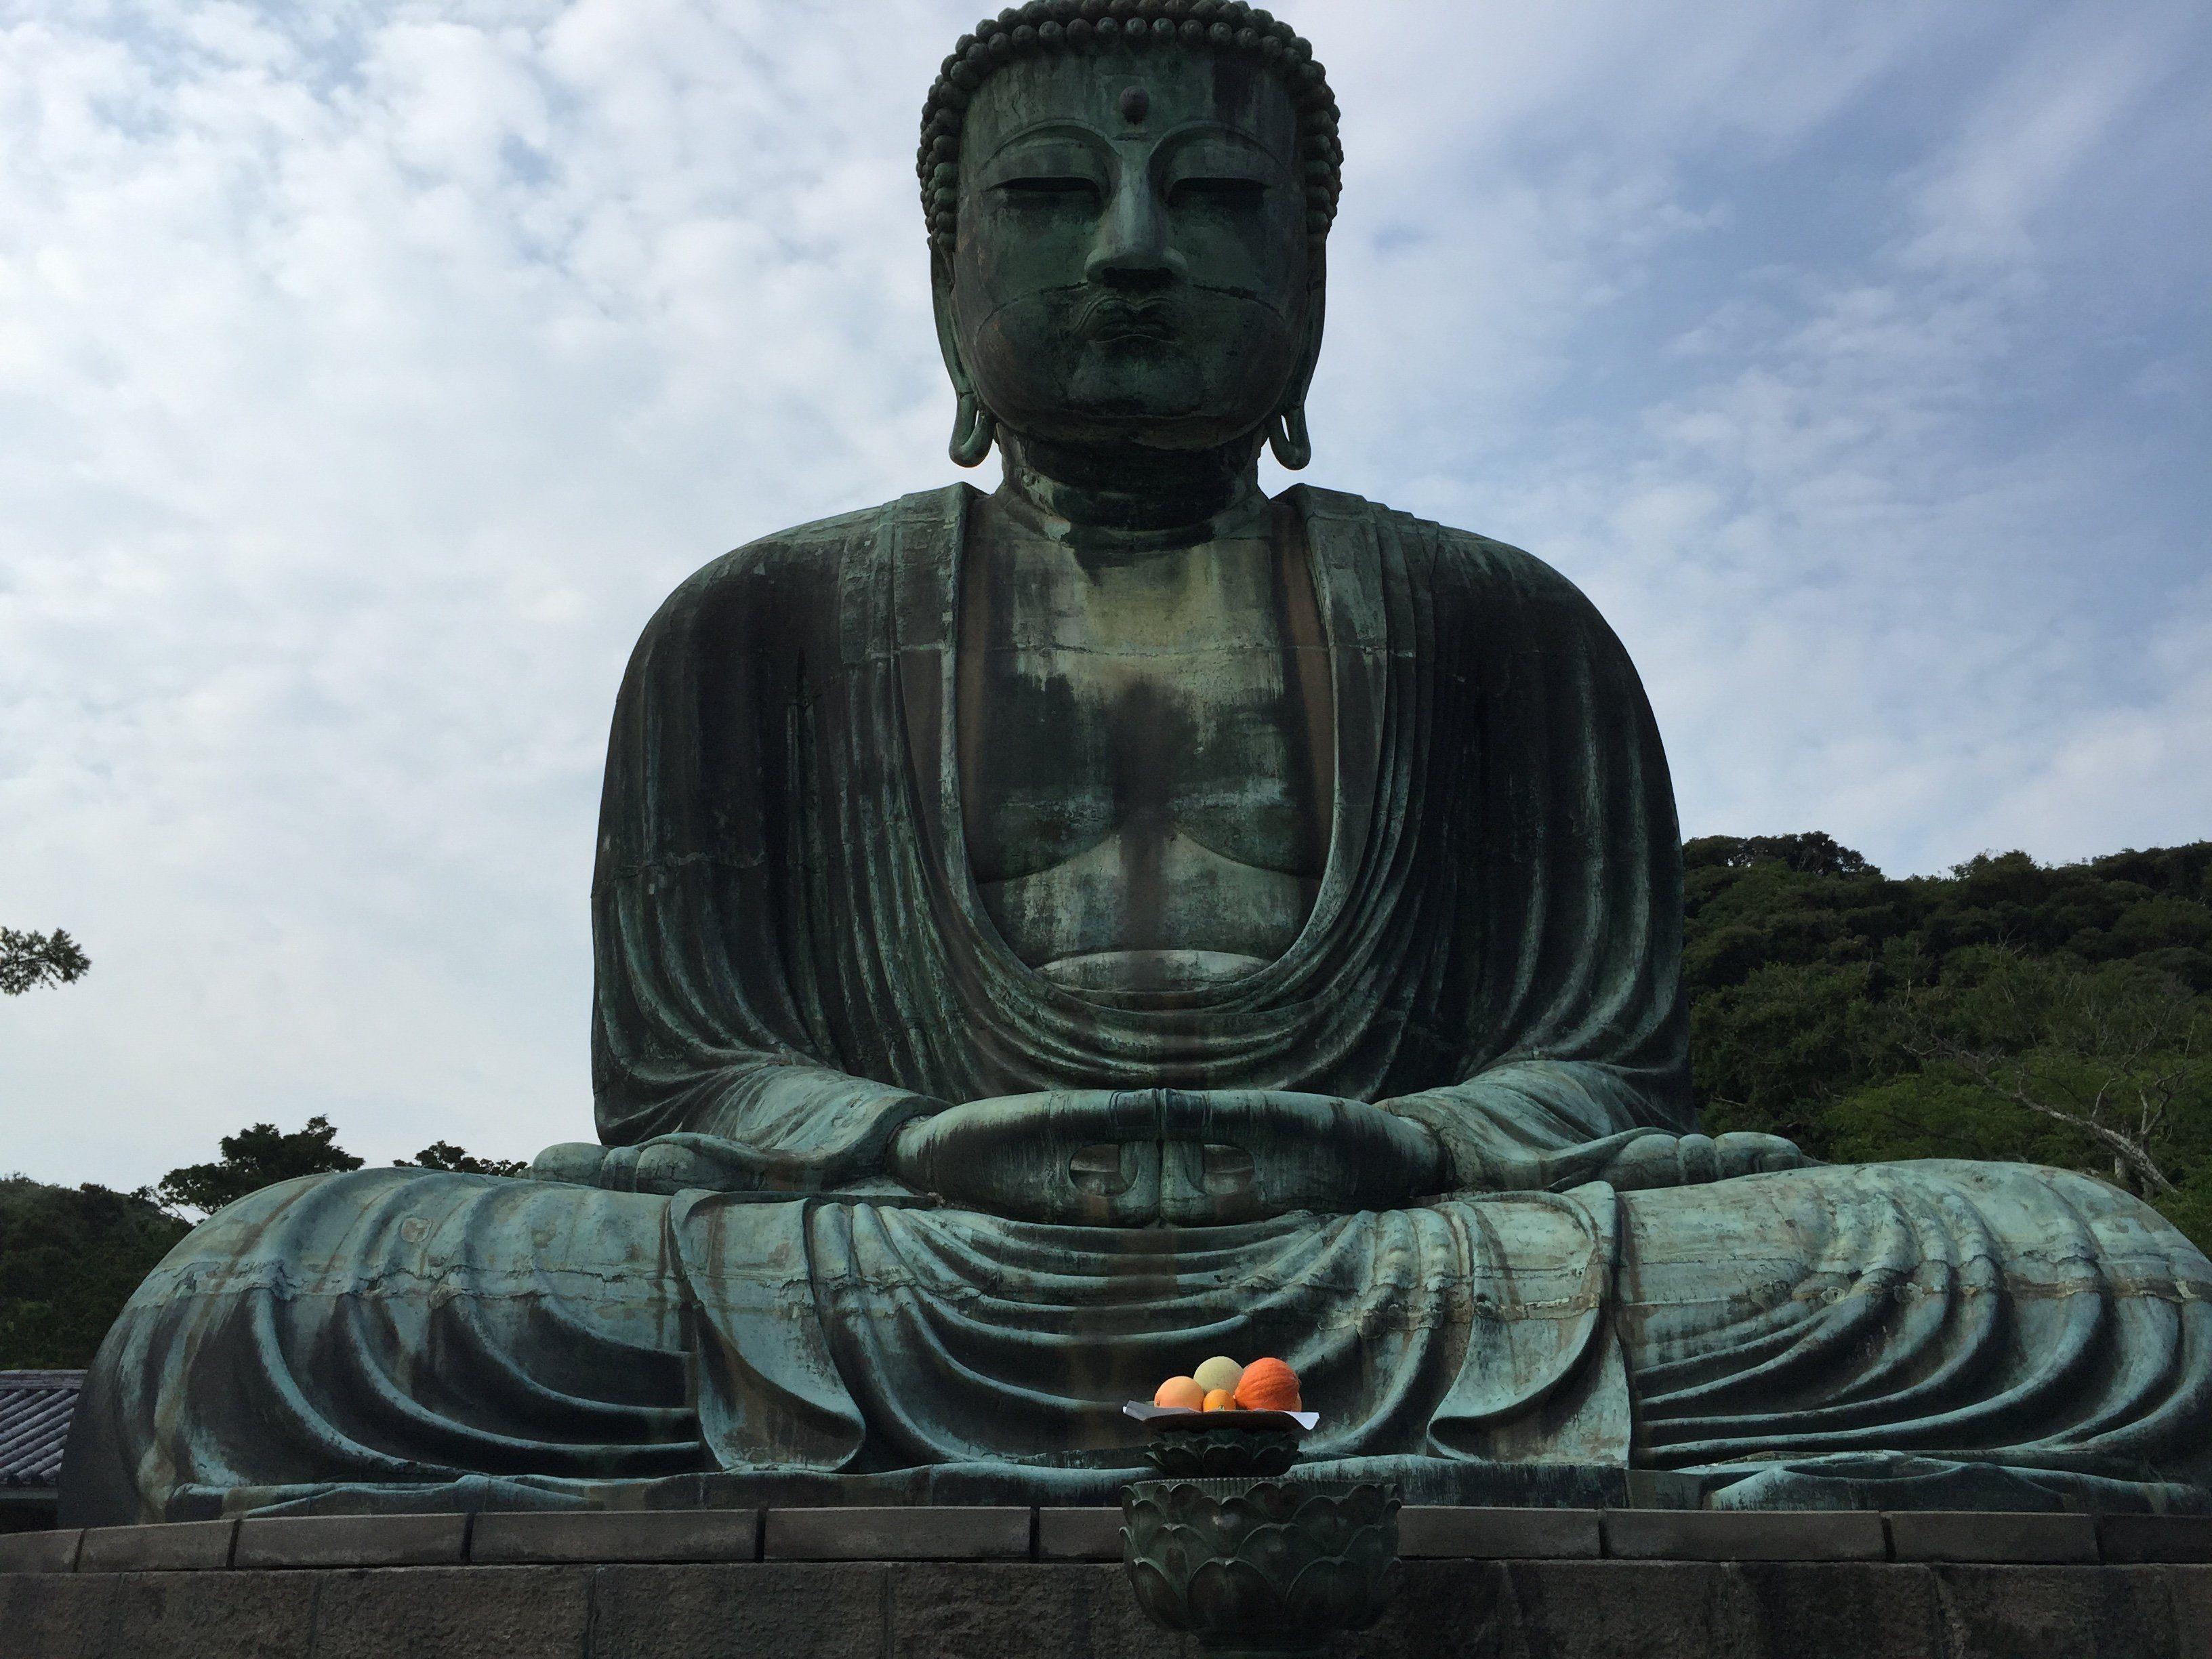 How Long Should You Stay In Japan - The Great Buddha, Kotoku-in, Kamakura, Kanagawa, Japan